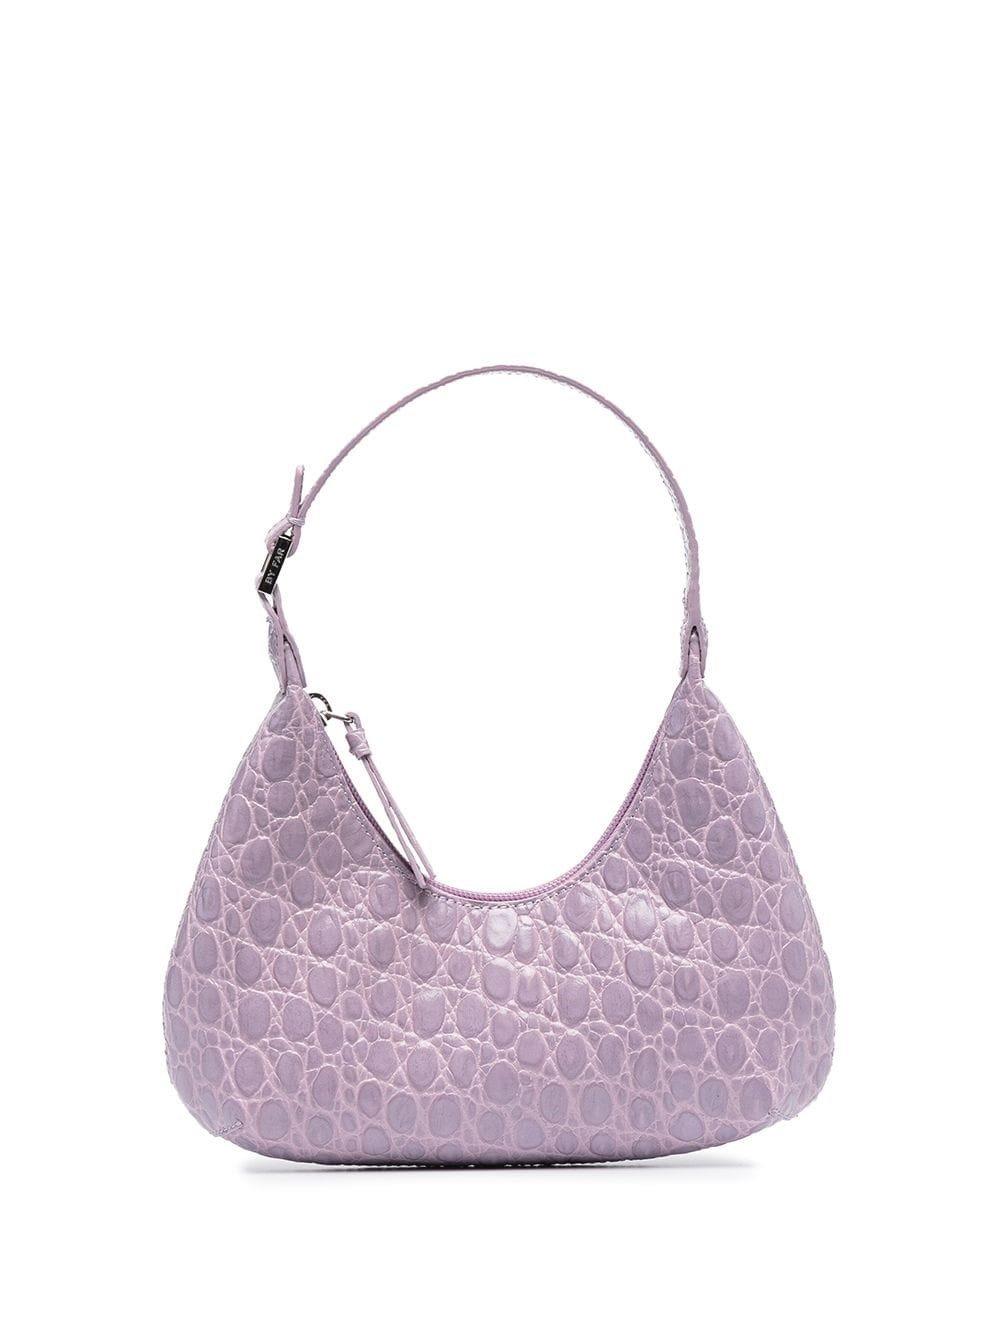 Shoulder Bag in Lilac Crocodile Print Leather